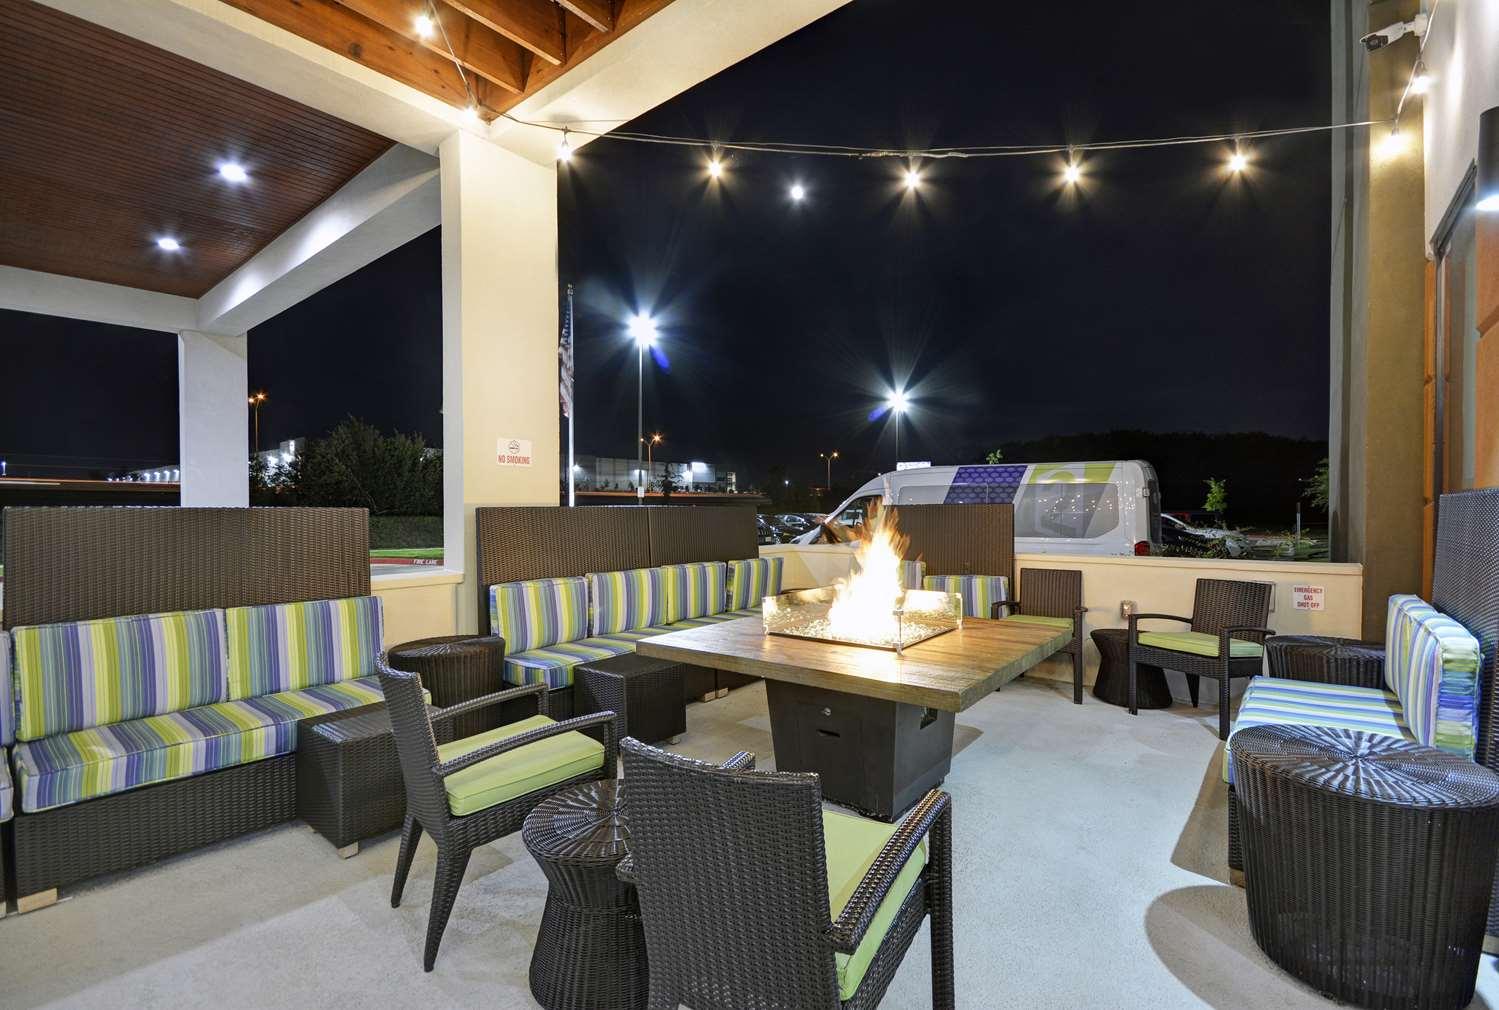 Home2 Suites by Hilton Dallas DeSoto